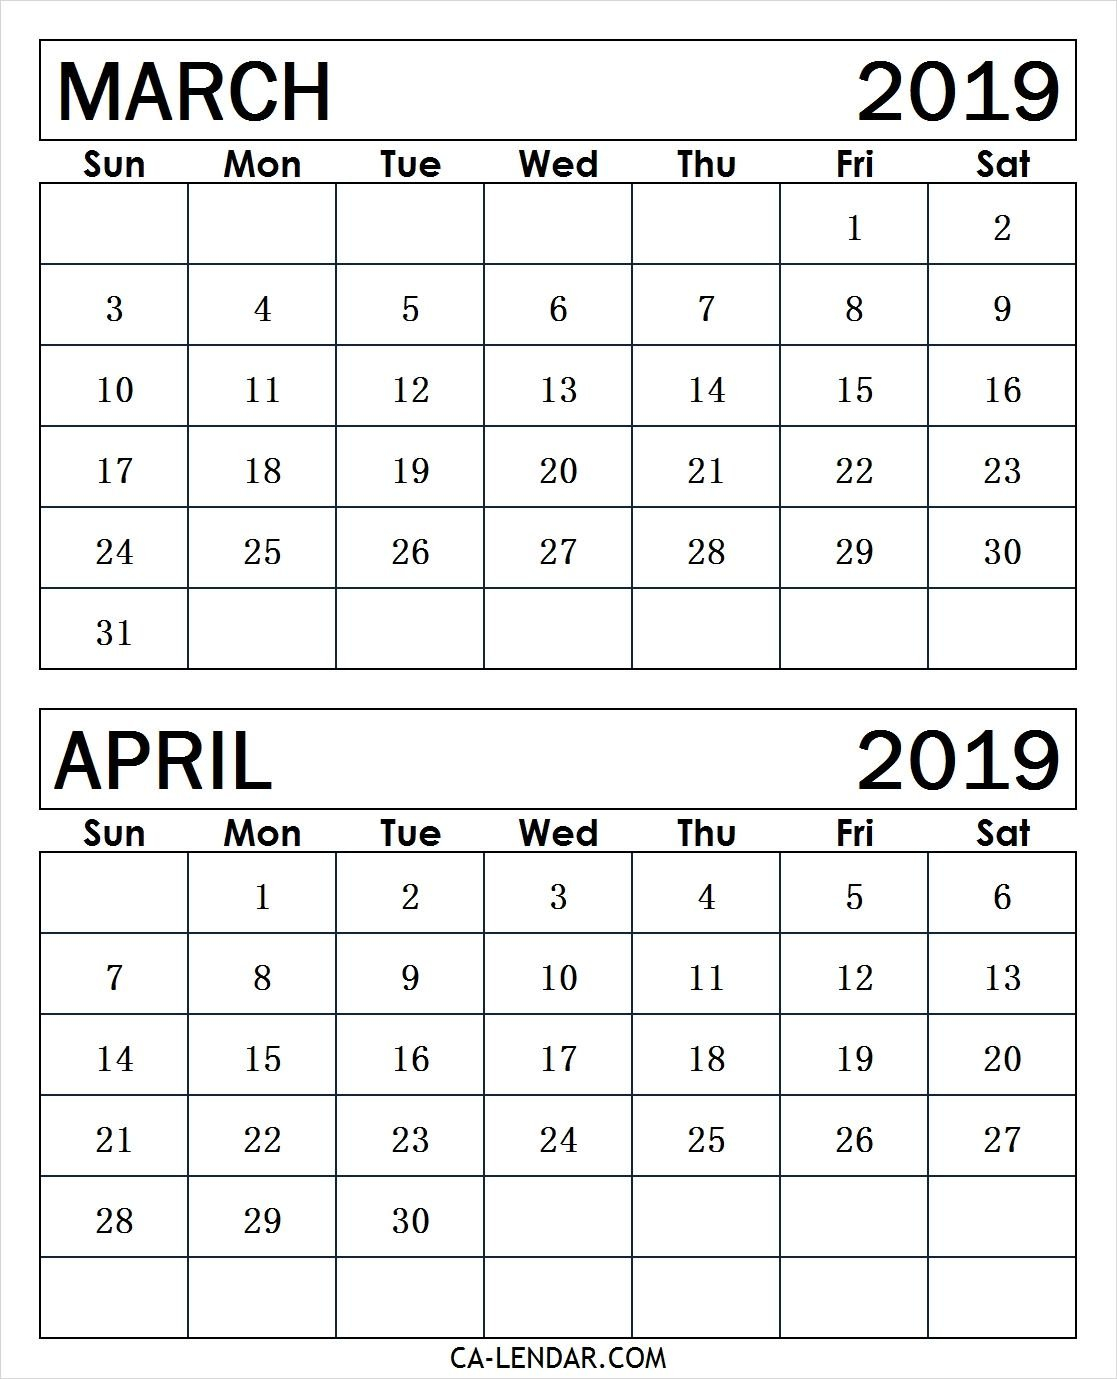 March April Calendar 2019 #march2019Calendar #april2019Calendar Calendar 2019 March April